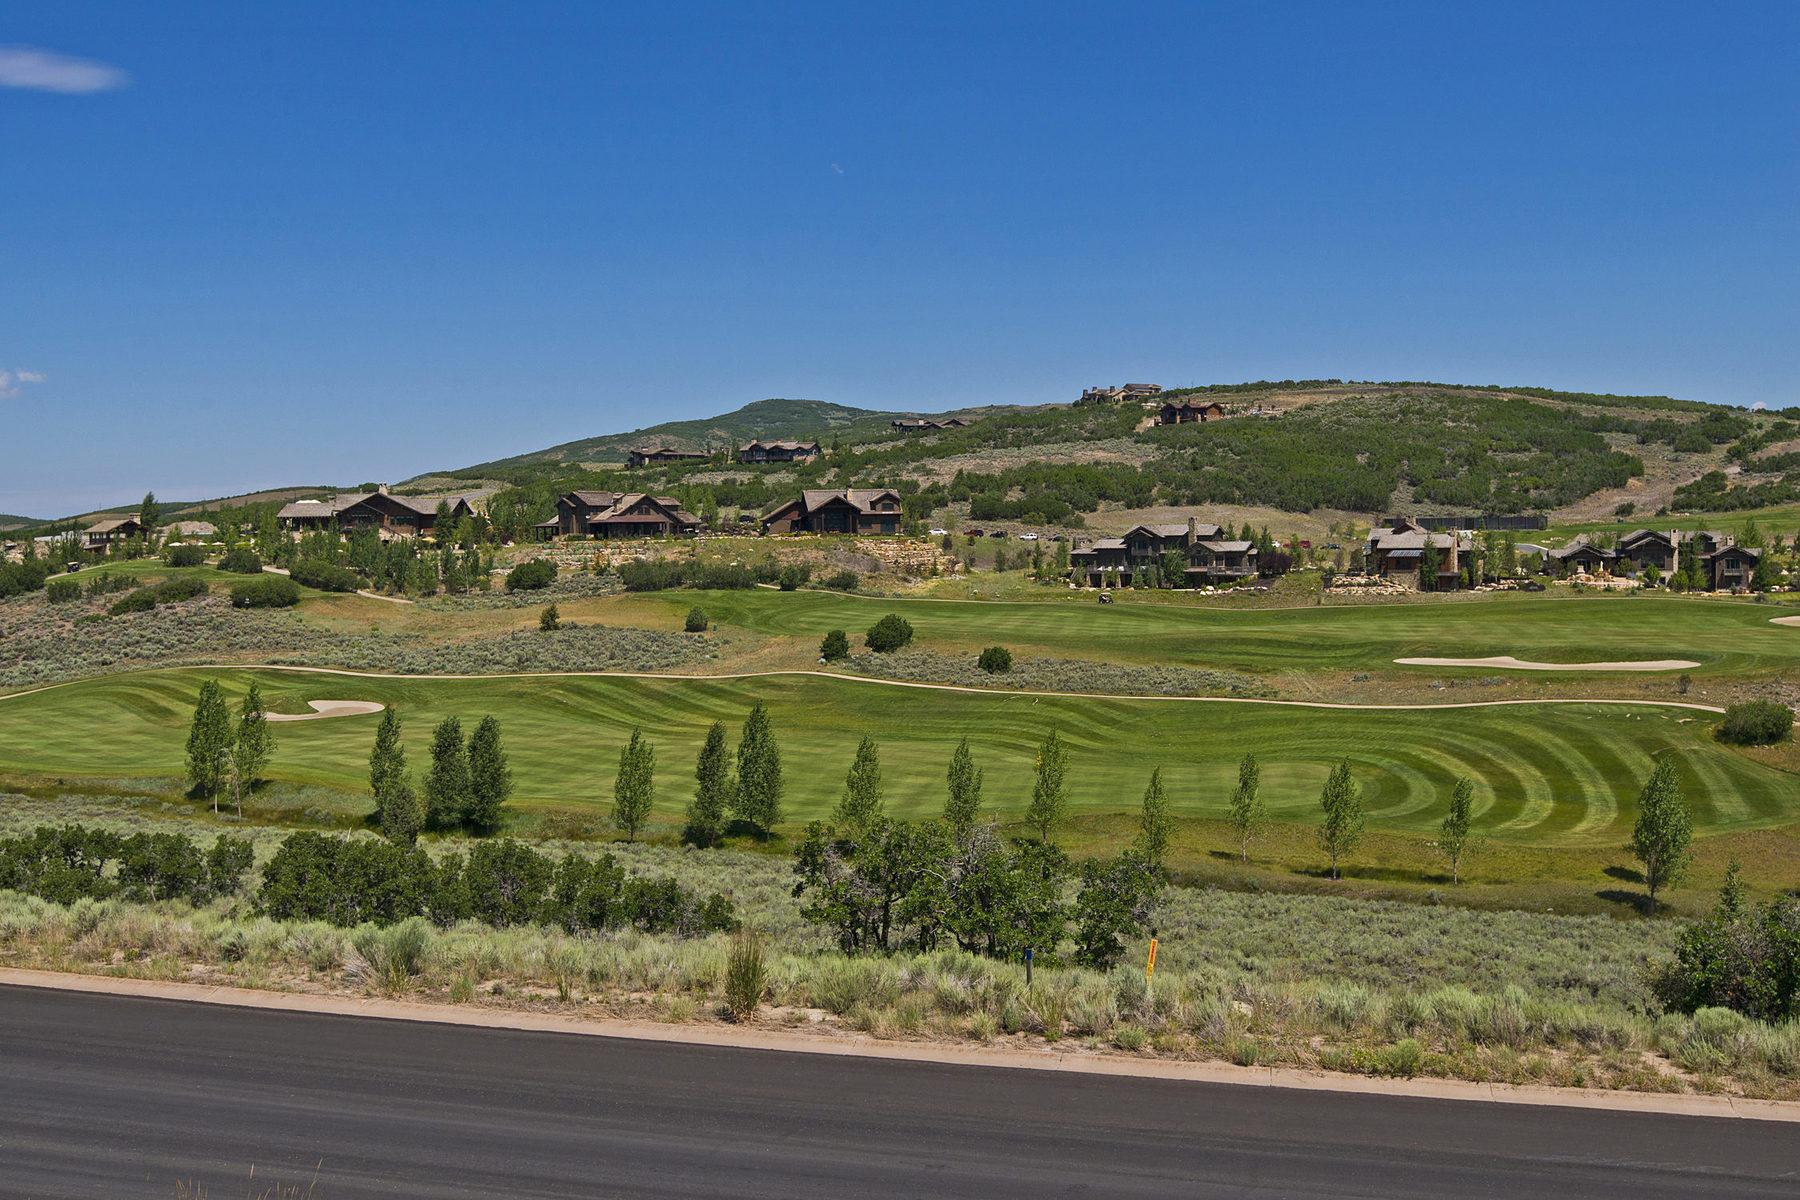 Terreno per Vendita alle ore Priced to Sell Now - Golf Course & Ski Run Views 9405 N Uinta Dr Lot 28 Heber City, Utah, 84036 Stati Uniti